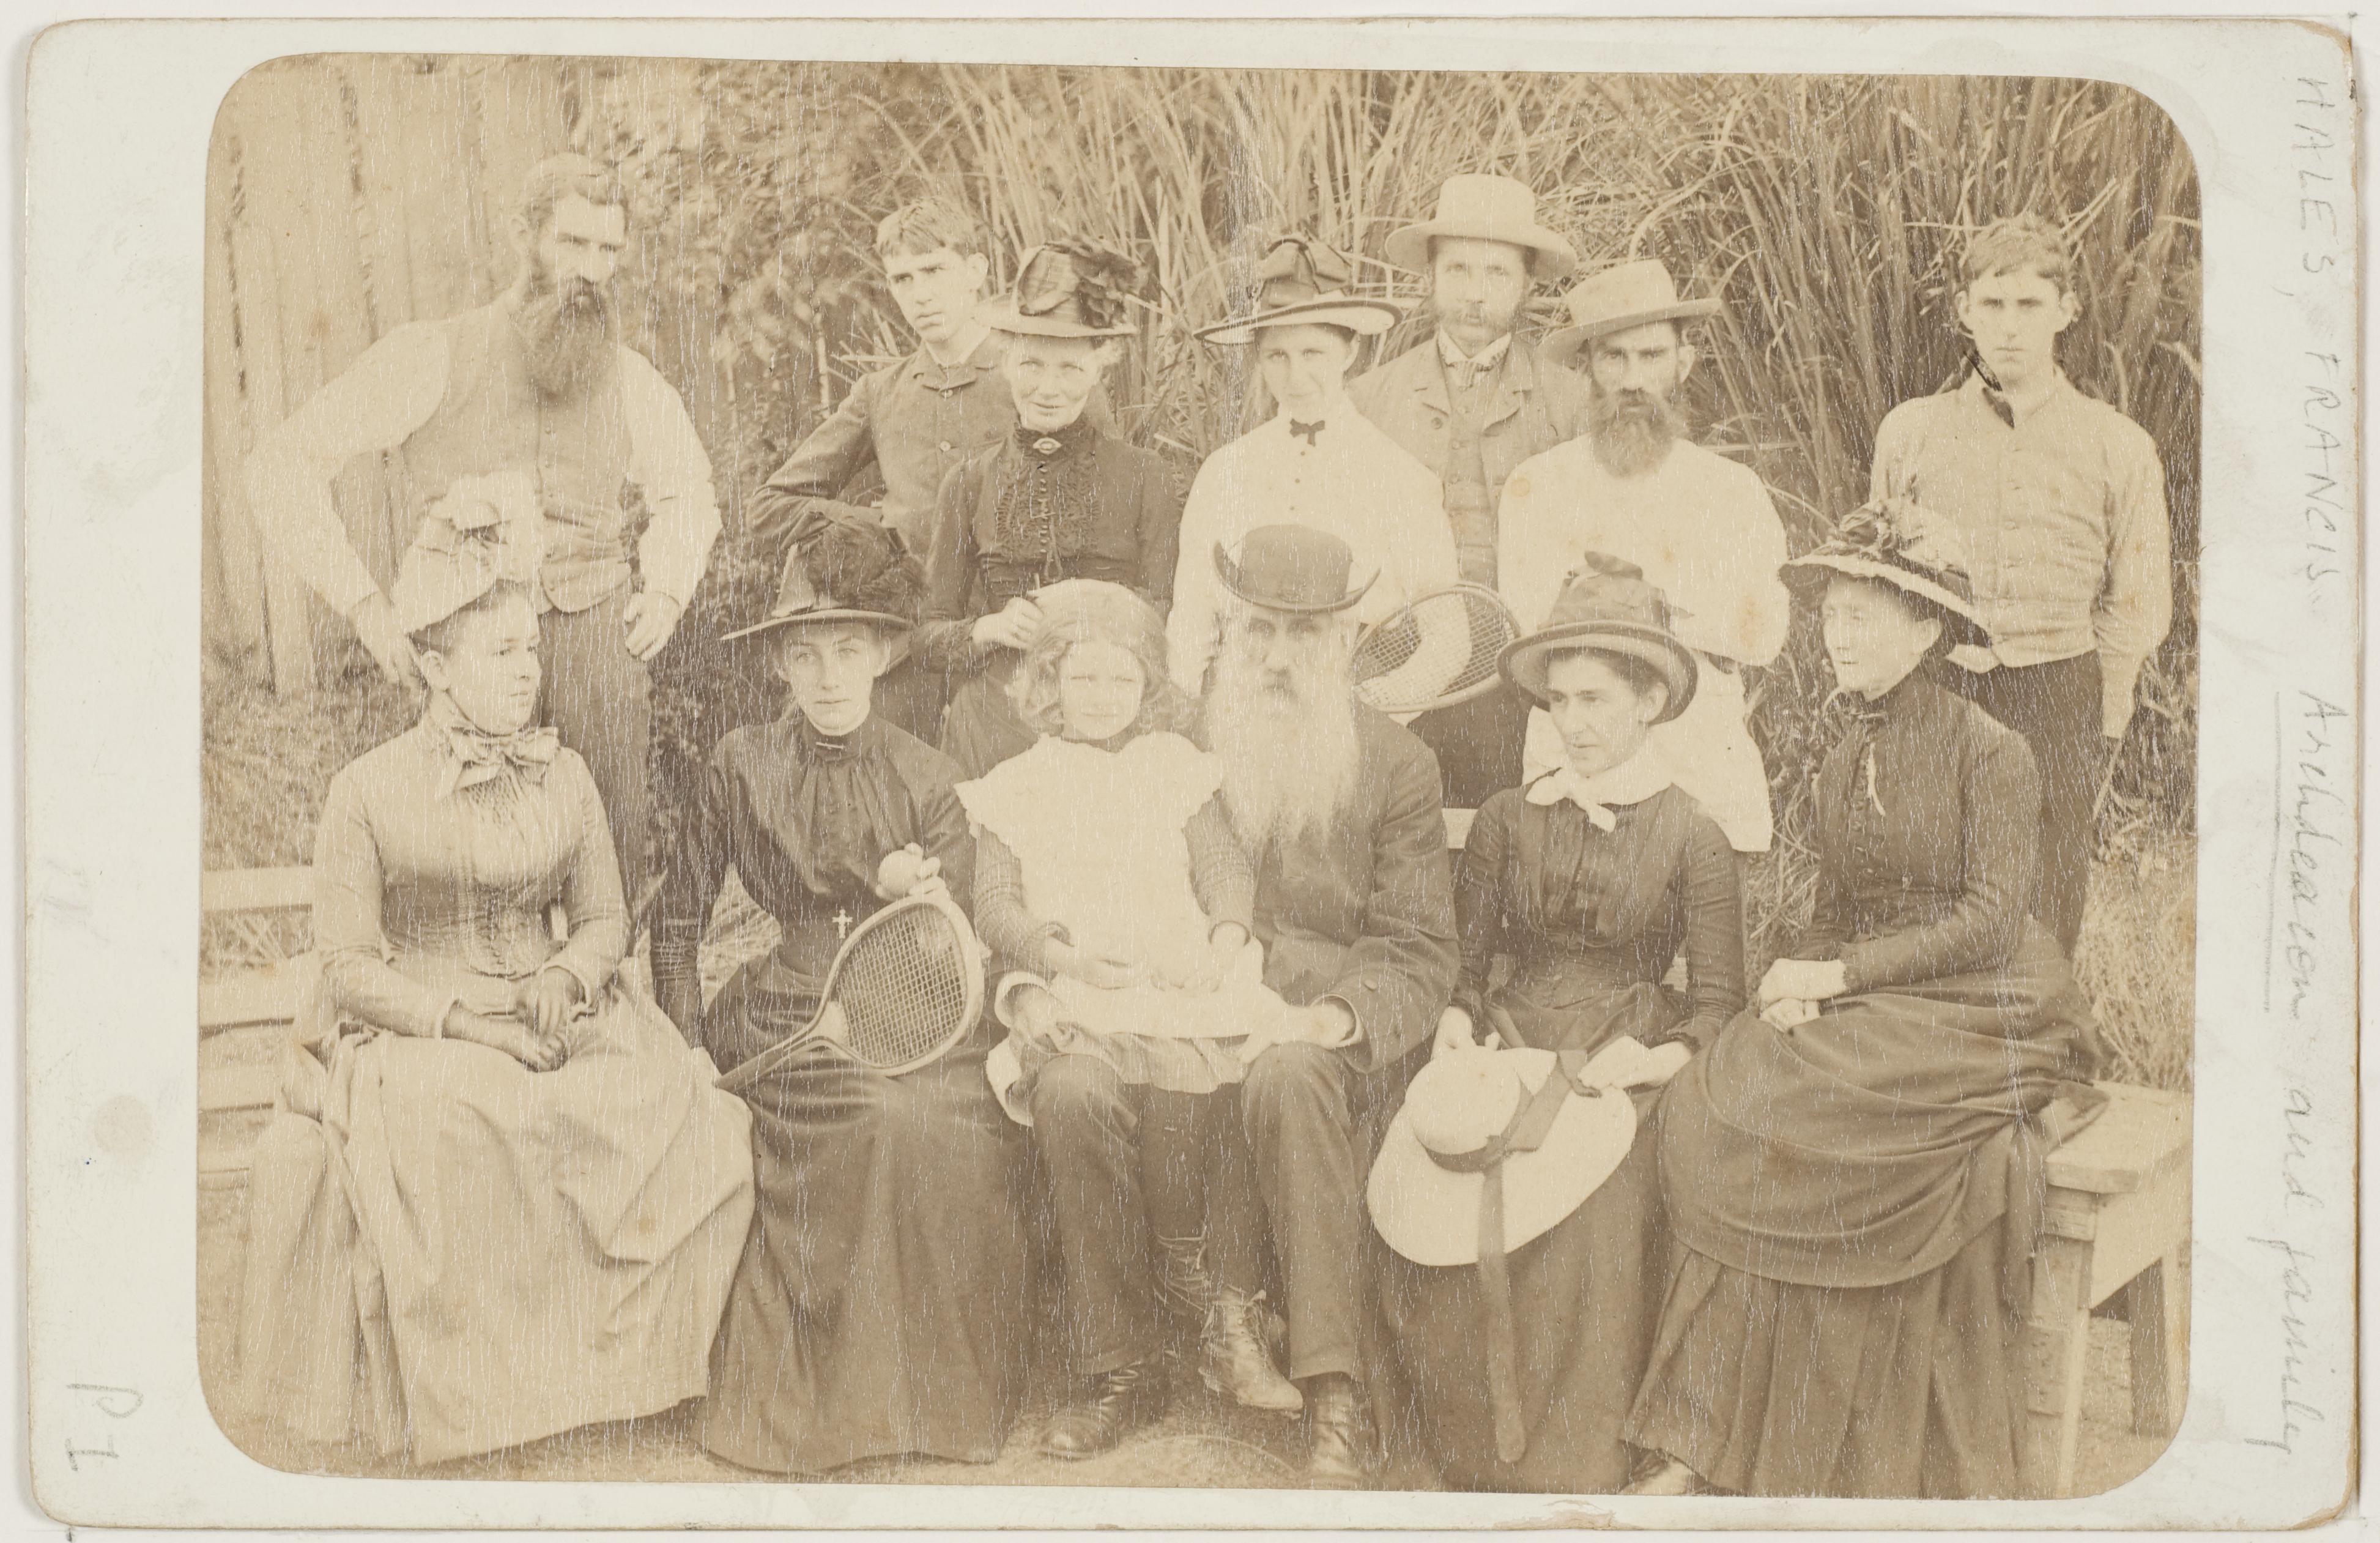 Hales family tennis party, Lyttleton Street, Launceston, TAS, January 1899, photographer unknown